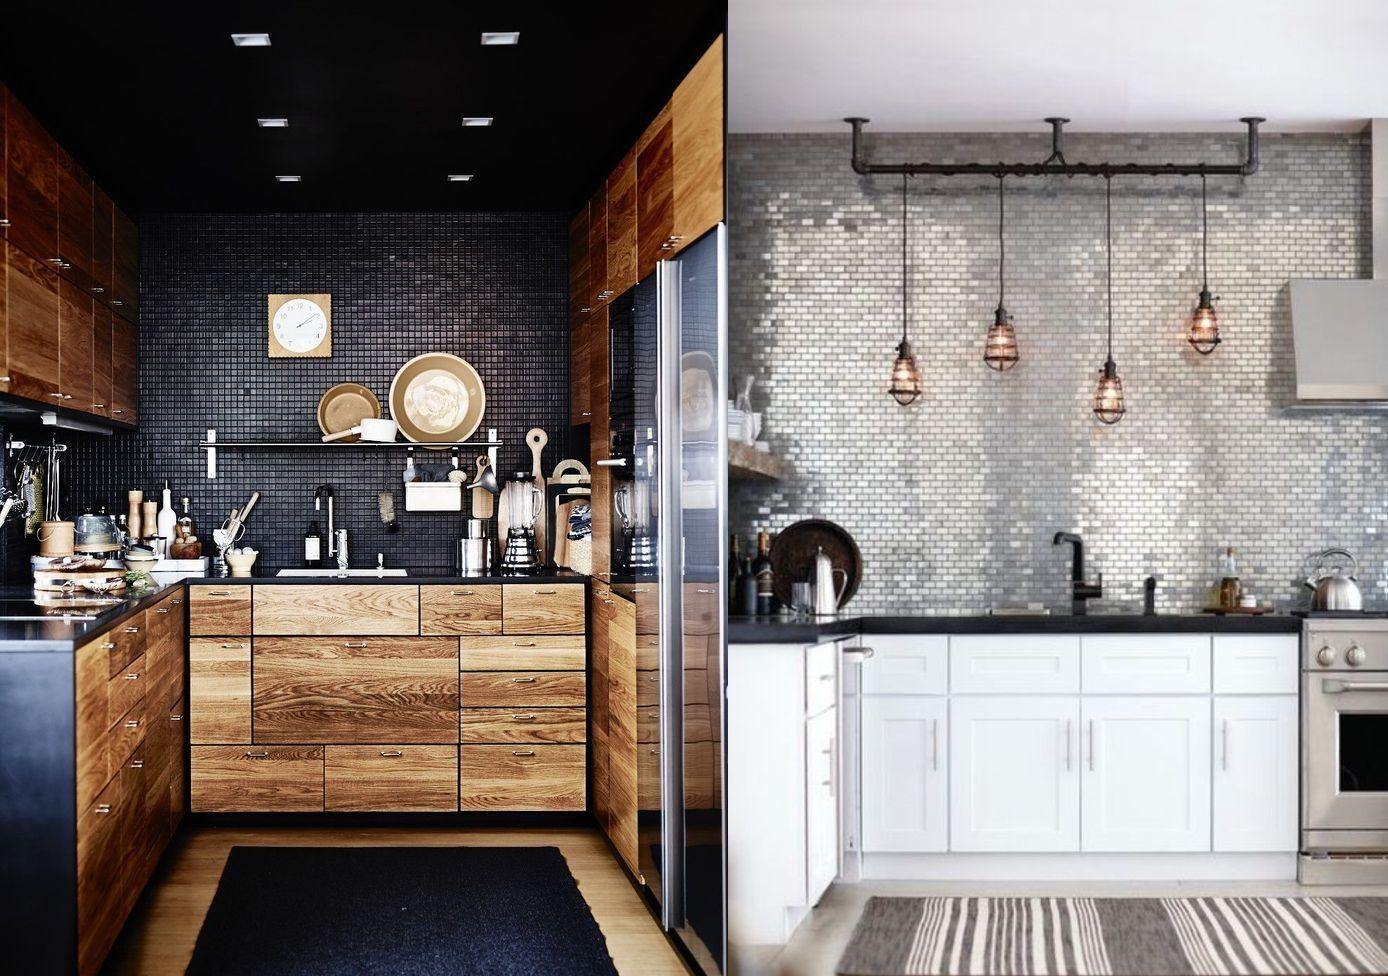 9 Small Kitchen Design Ideas Photo Gallery   Kitchen design small ...